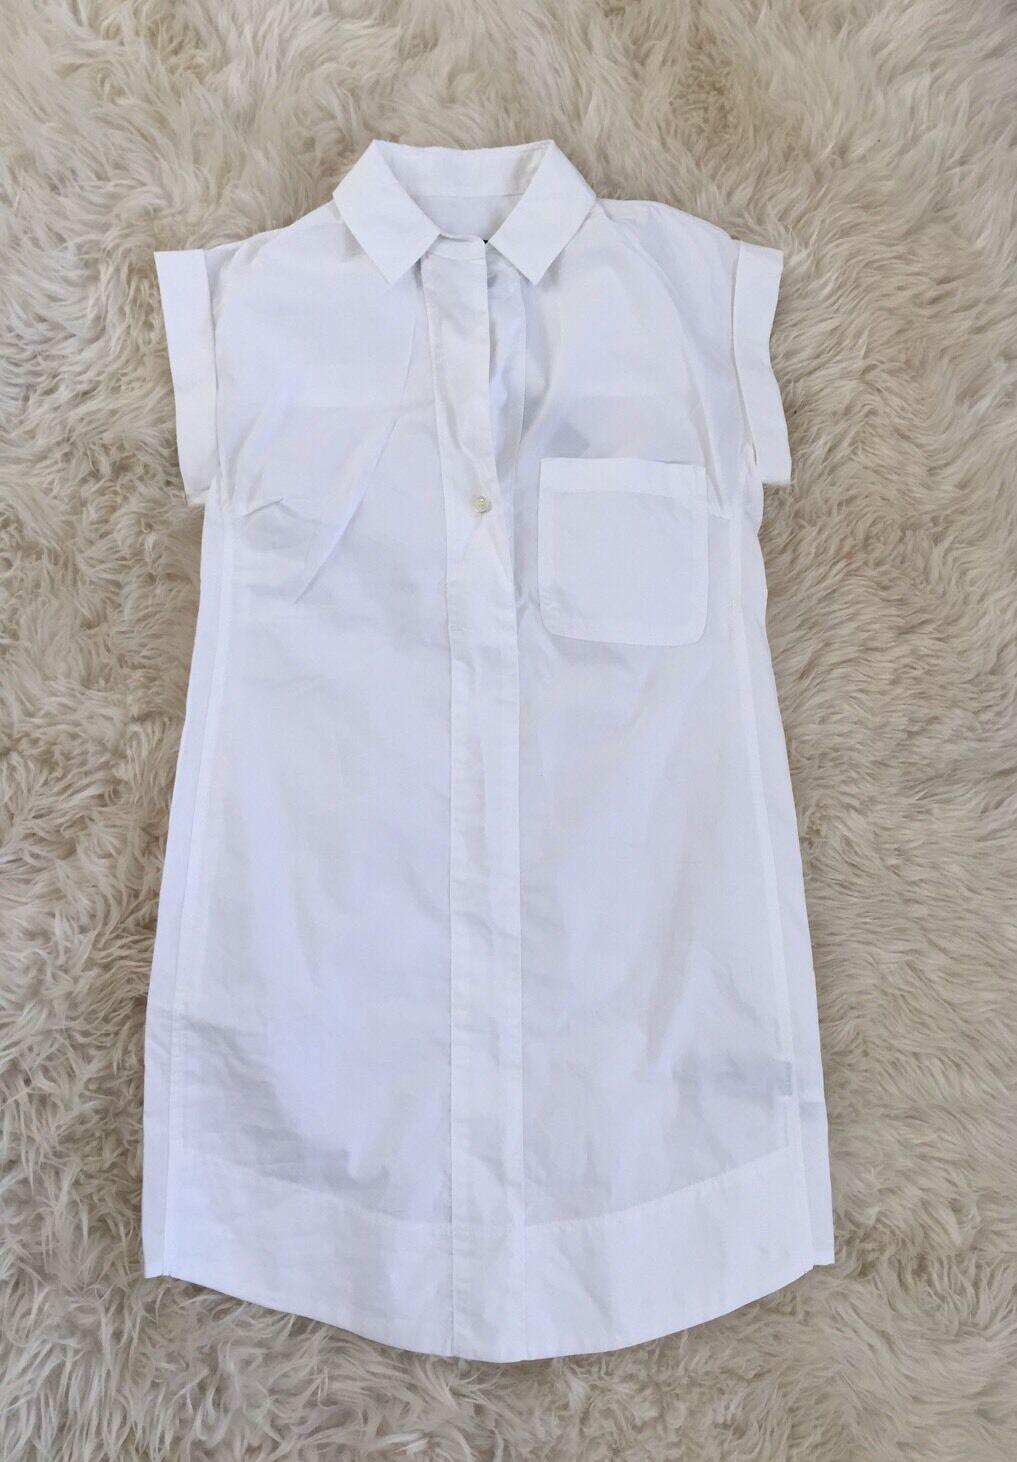 J CREW Short-Sleeve Cotton Shirtdress Sz PXXS Weiß C7214